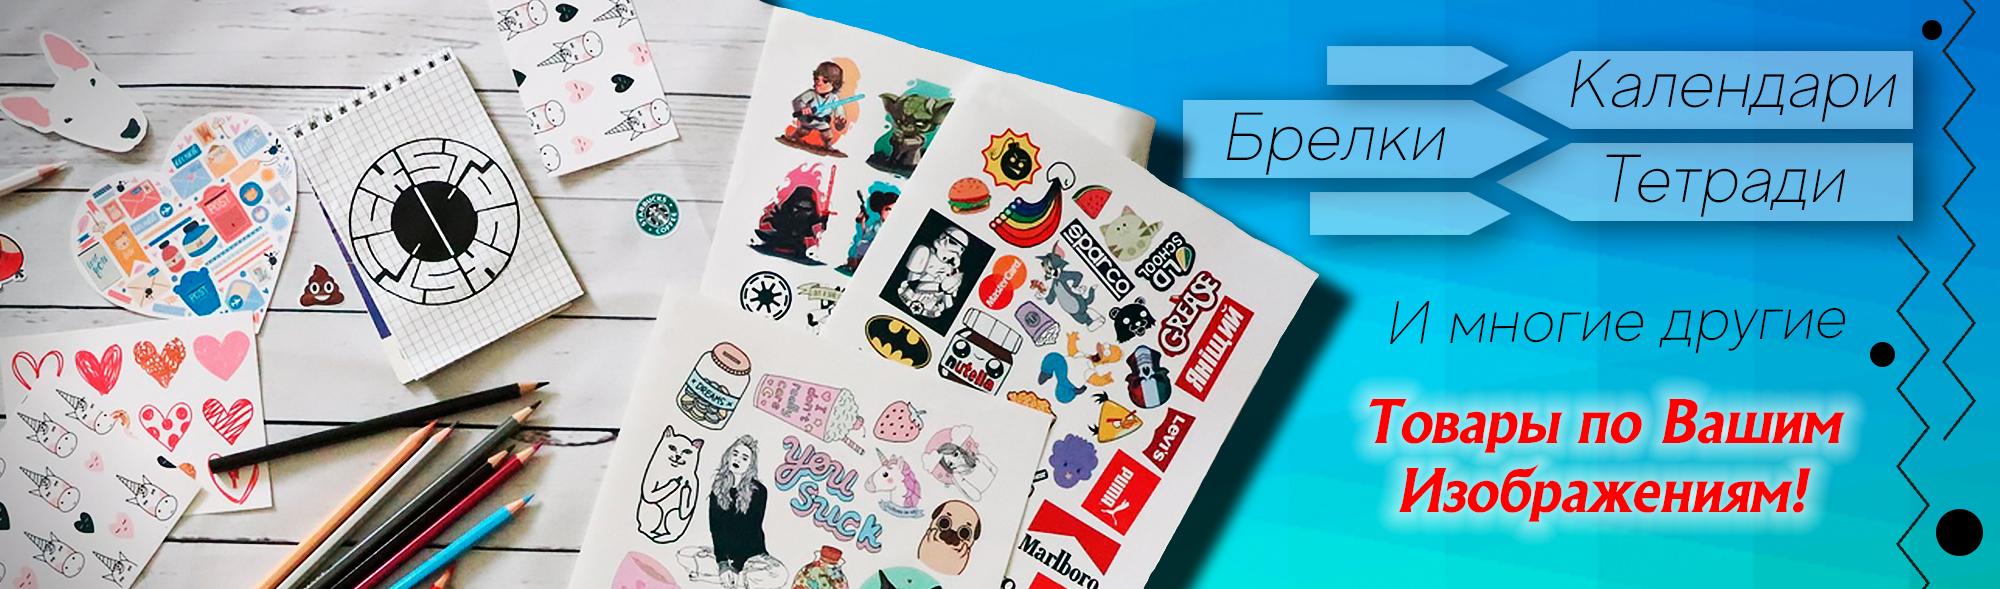 Сувенирные товары StickStock.ru